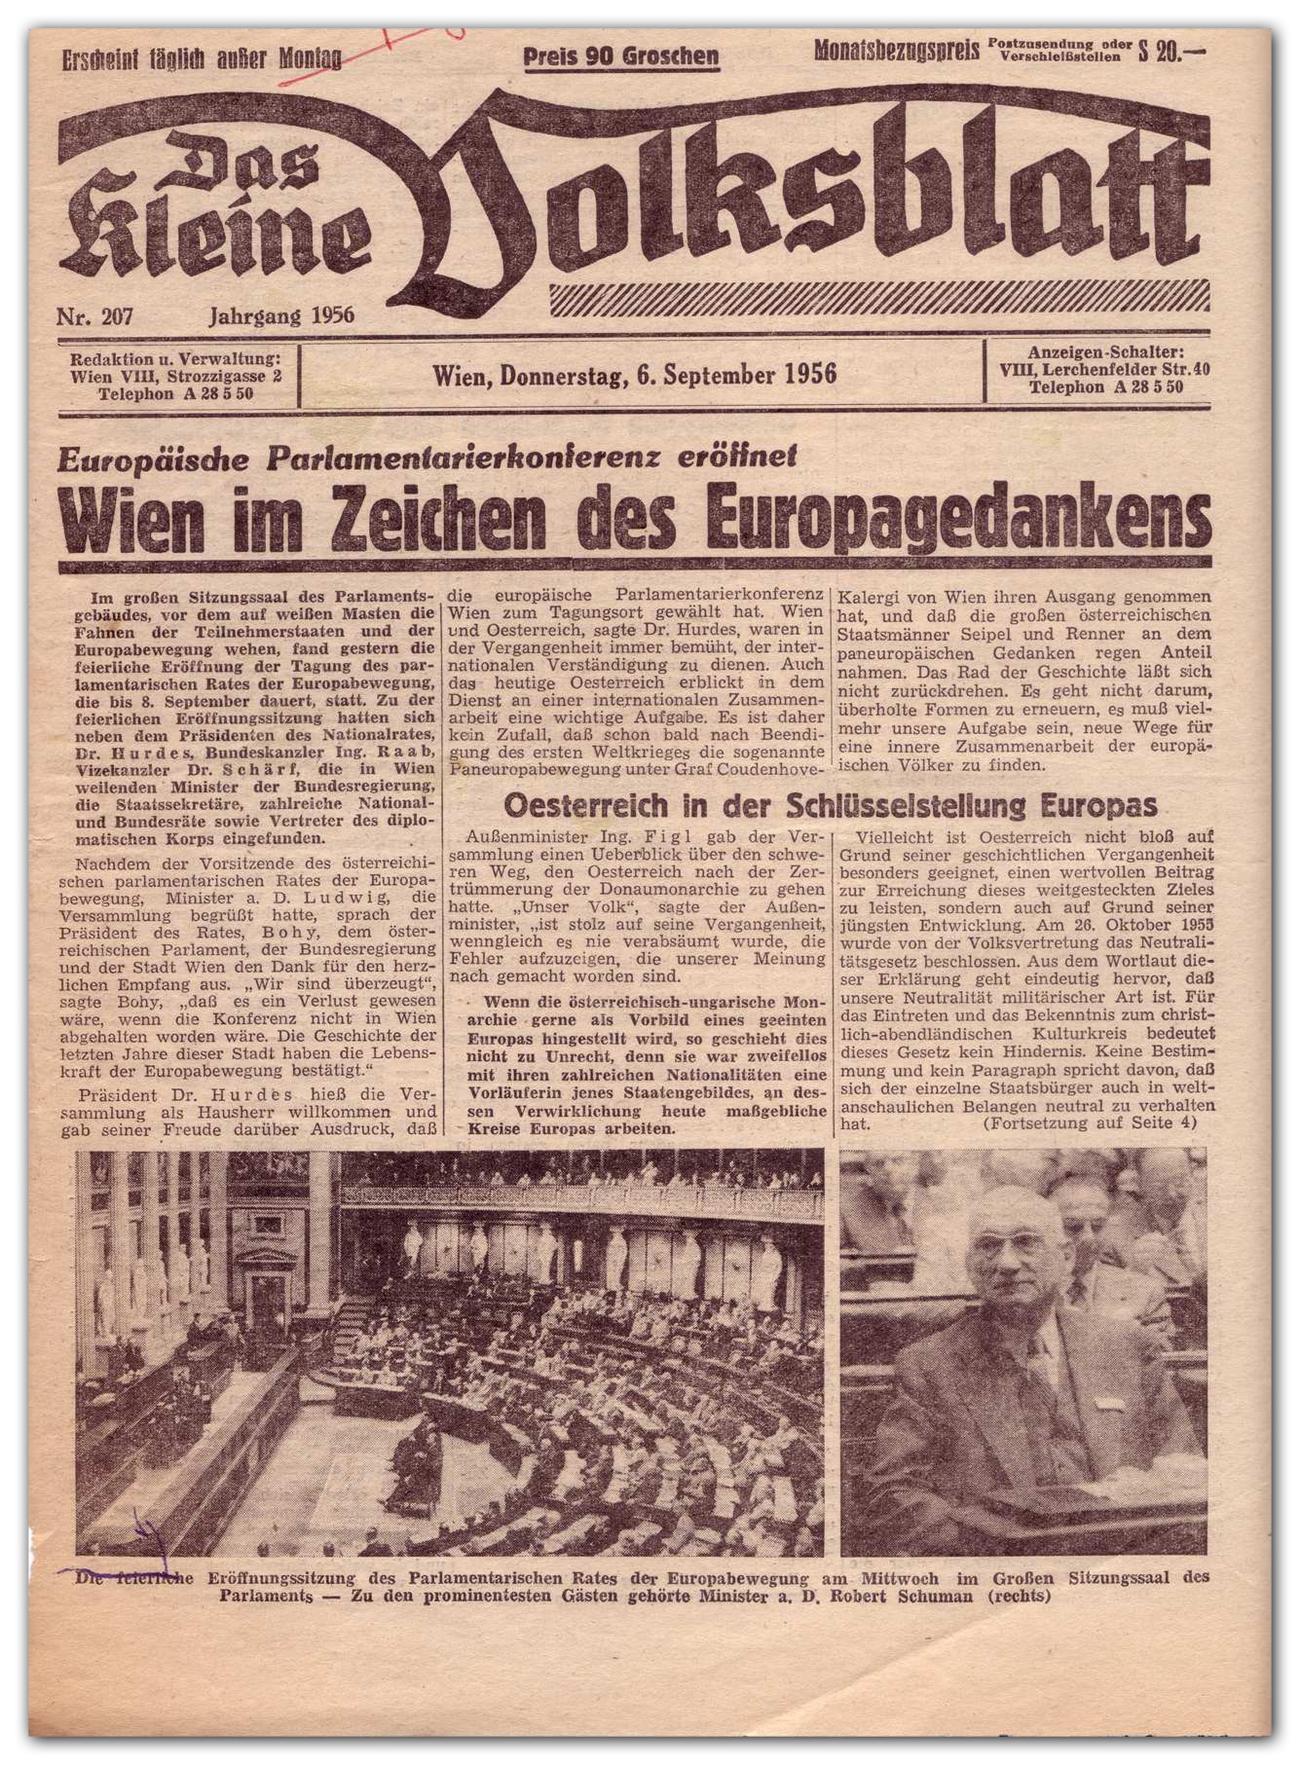 Front page of the Austrian daily newspaper Das Kleine